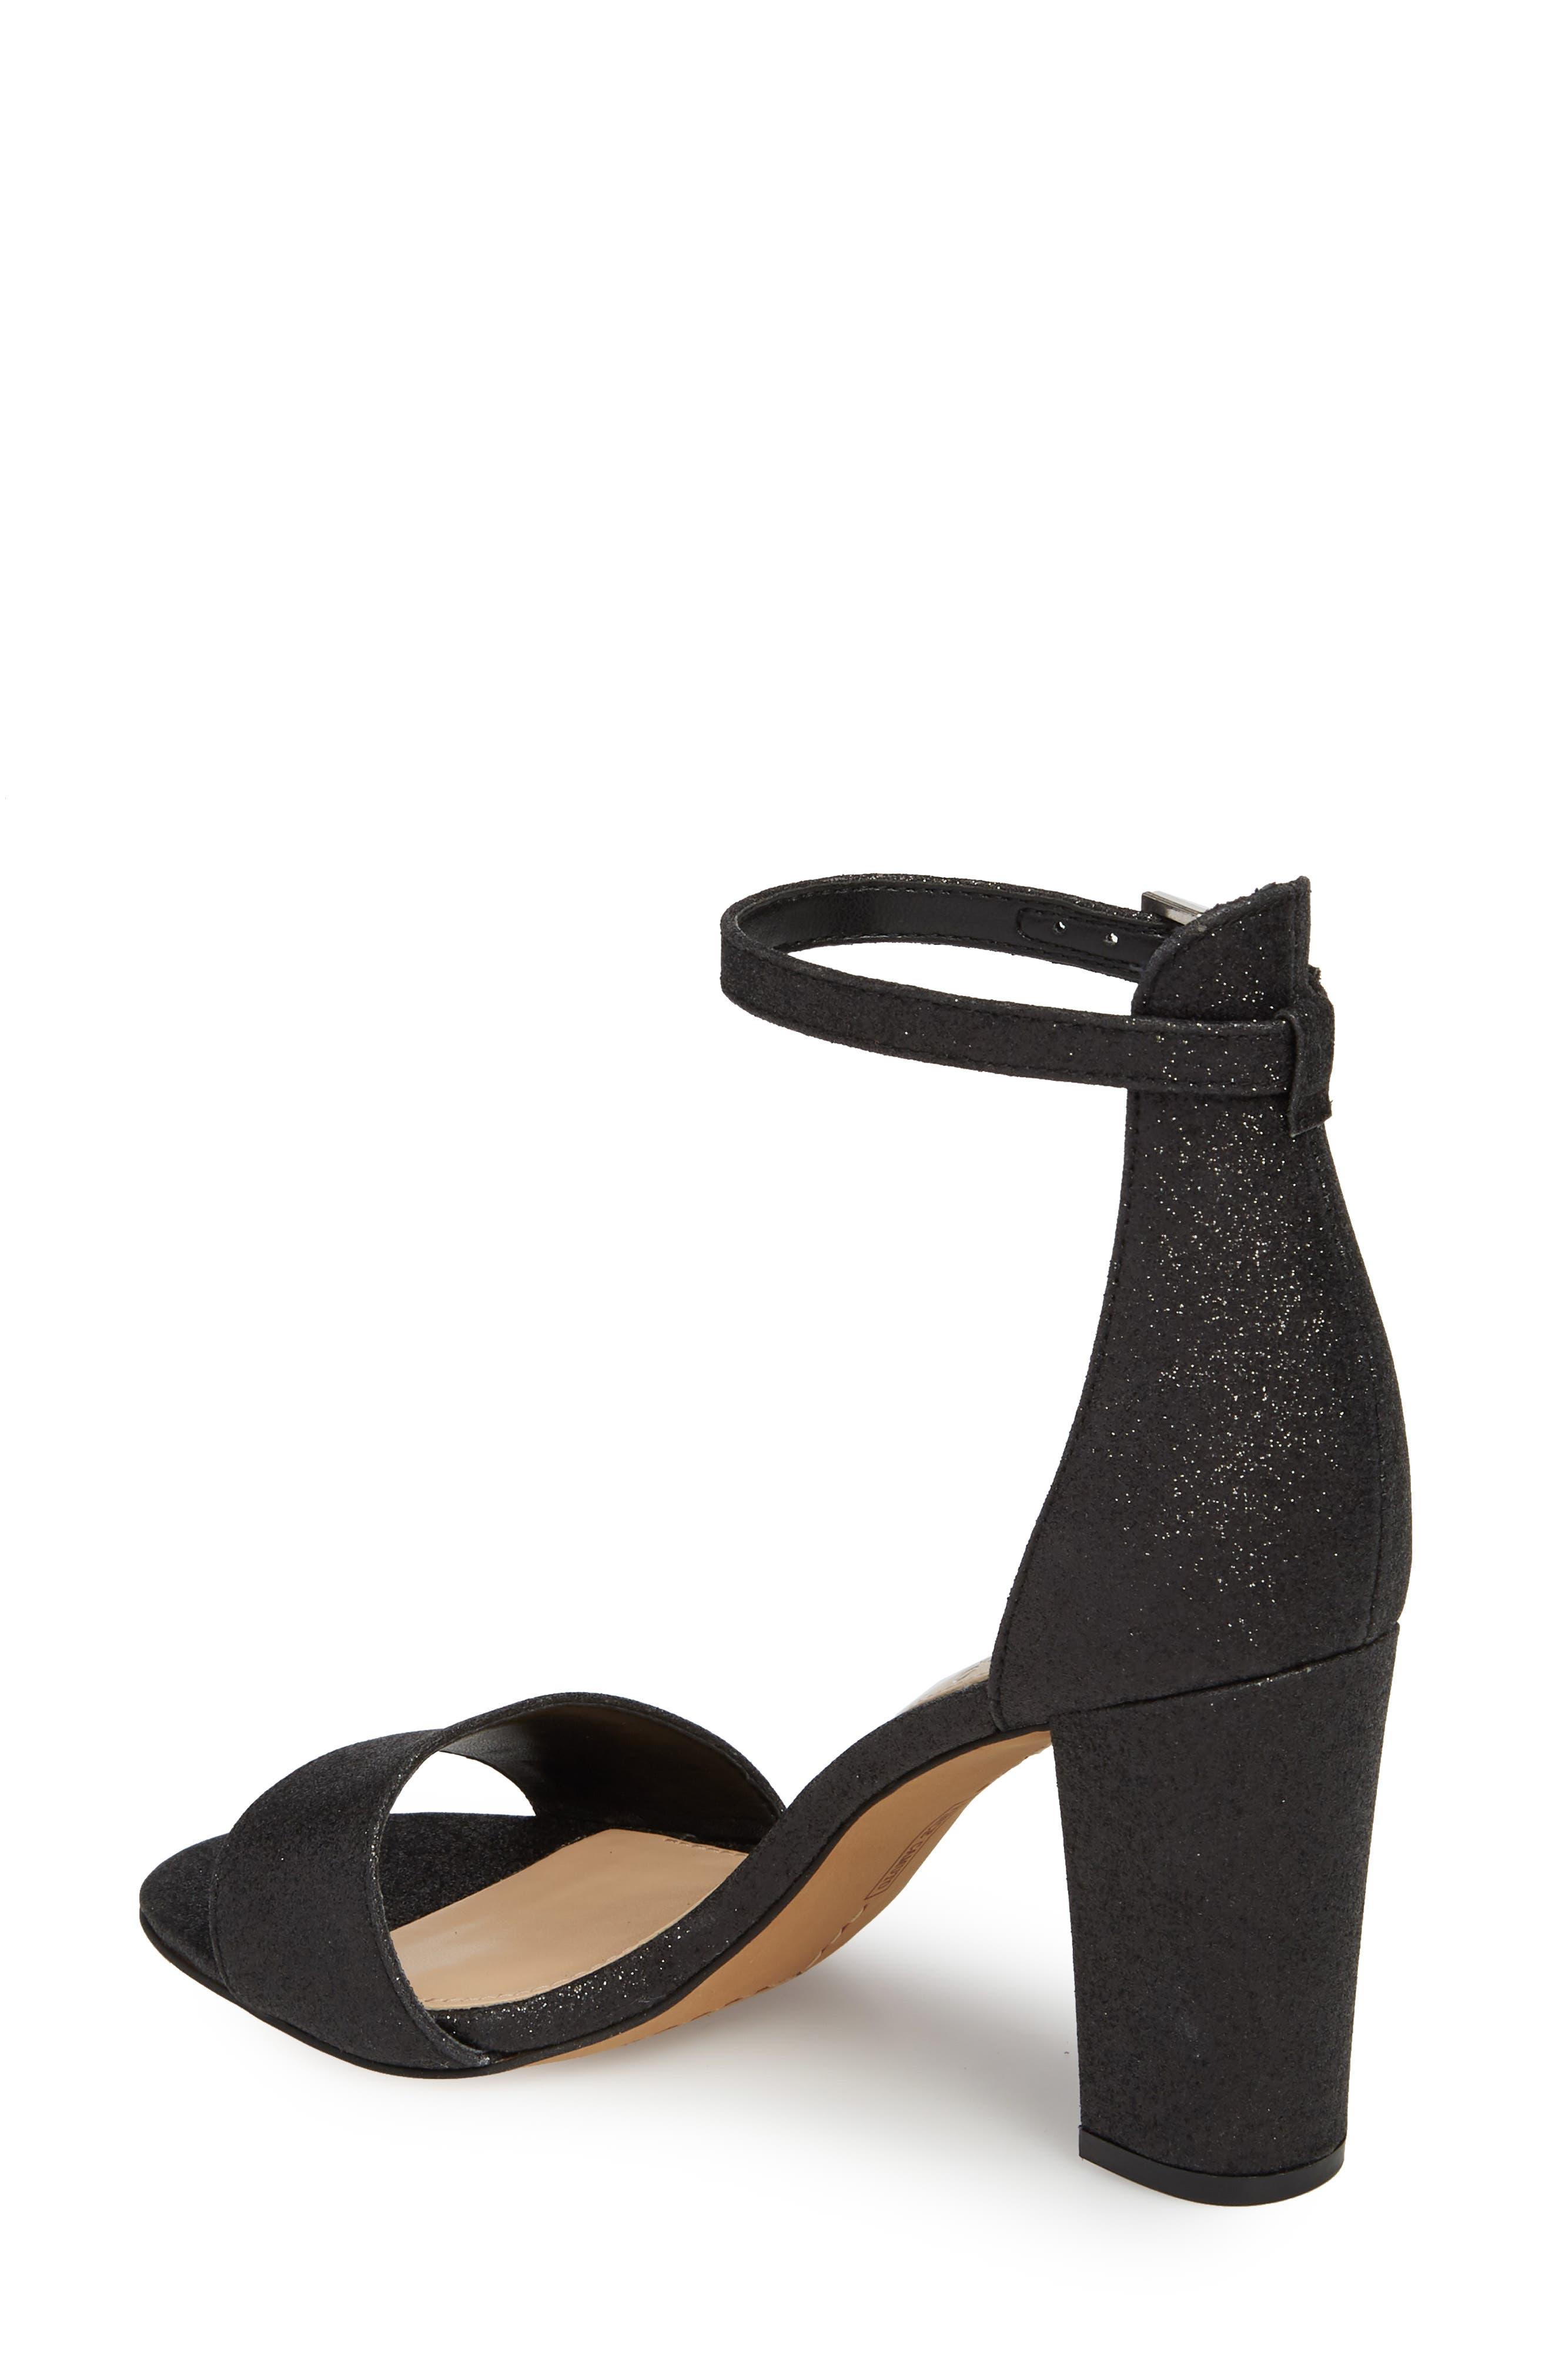 Corlina Ankle Strap Sandal,                             Alternate thumbnail 2, color,                             Black Glitter Fabric